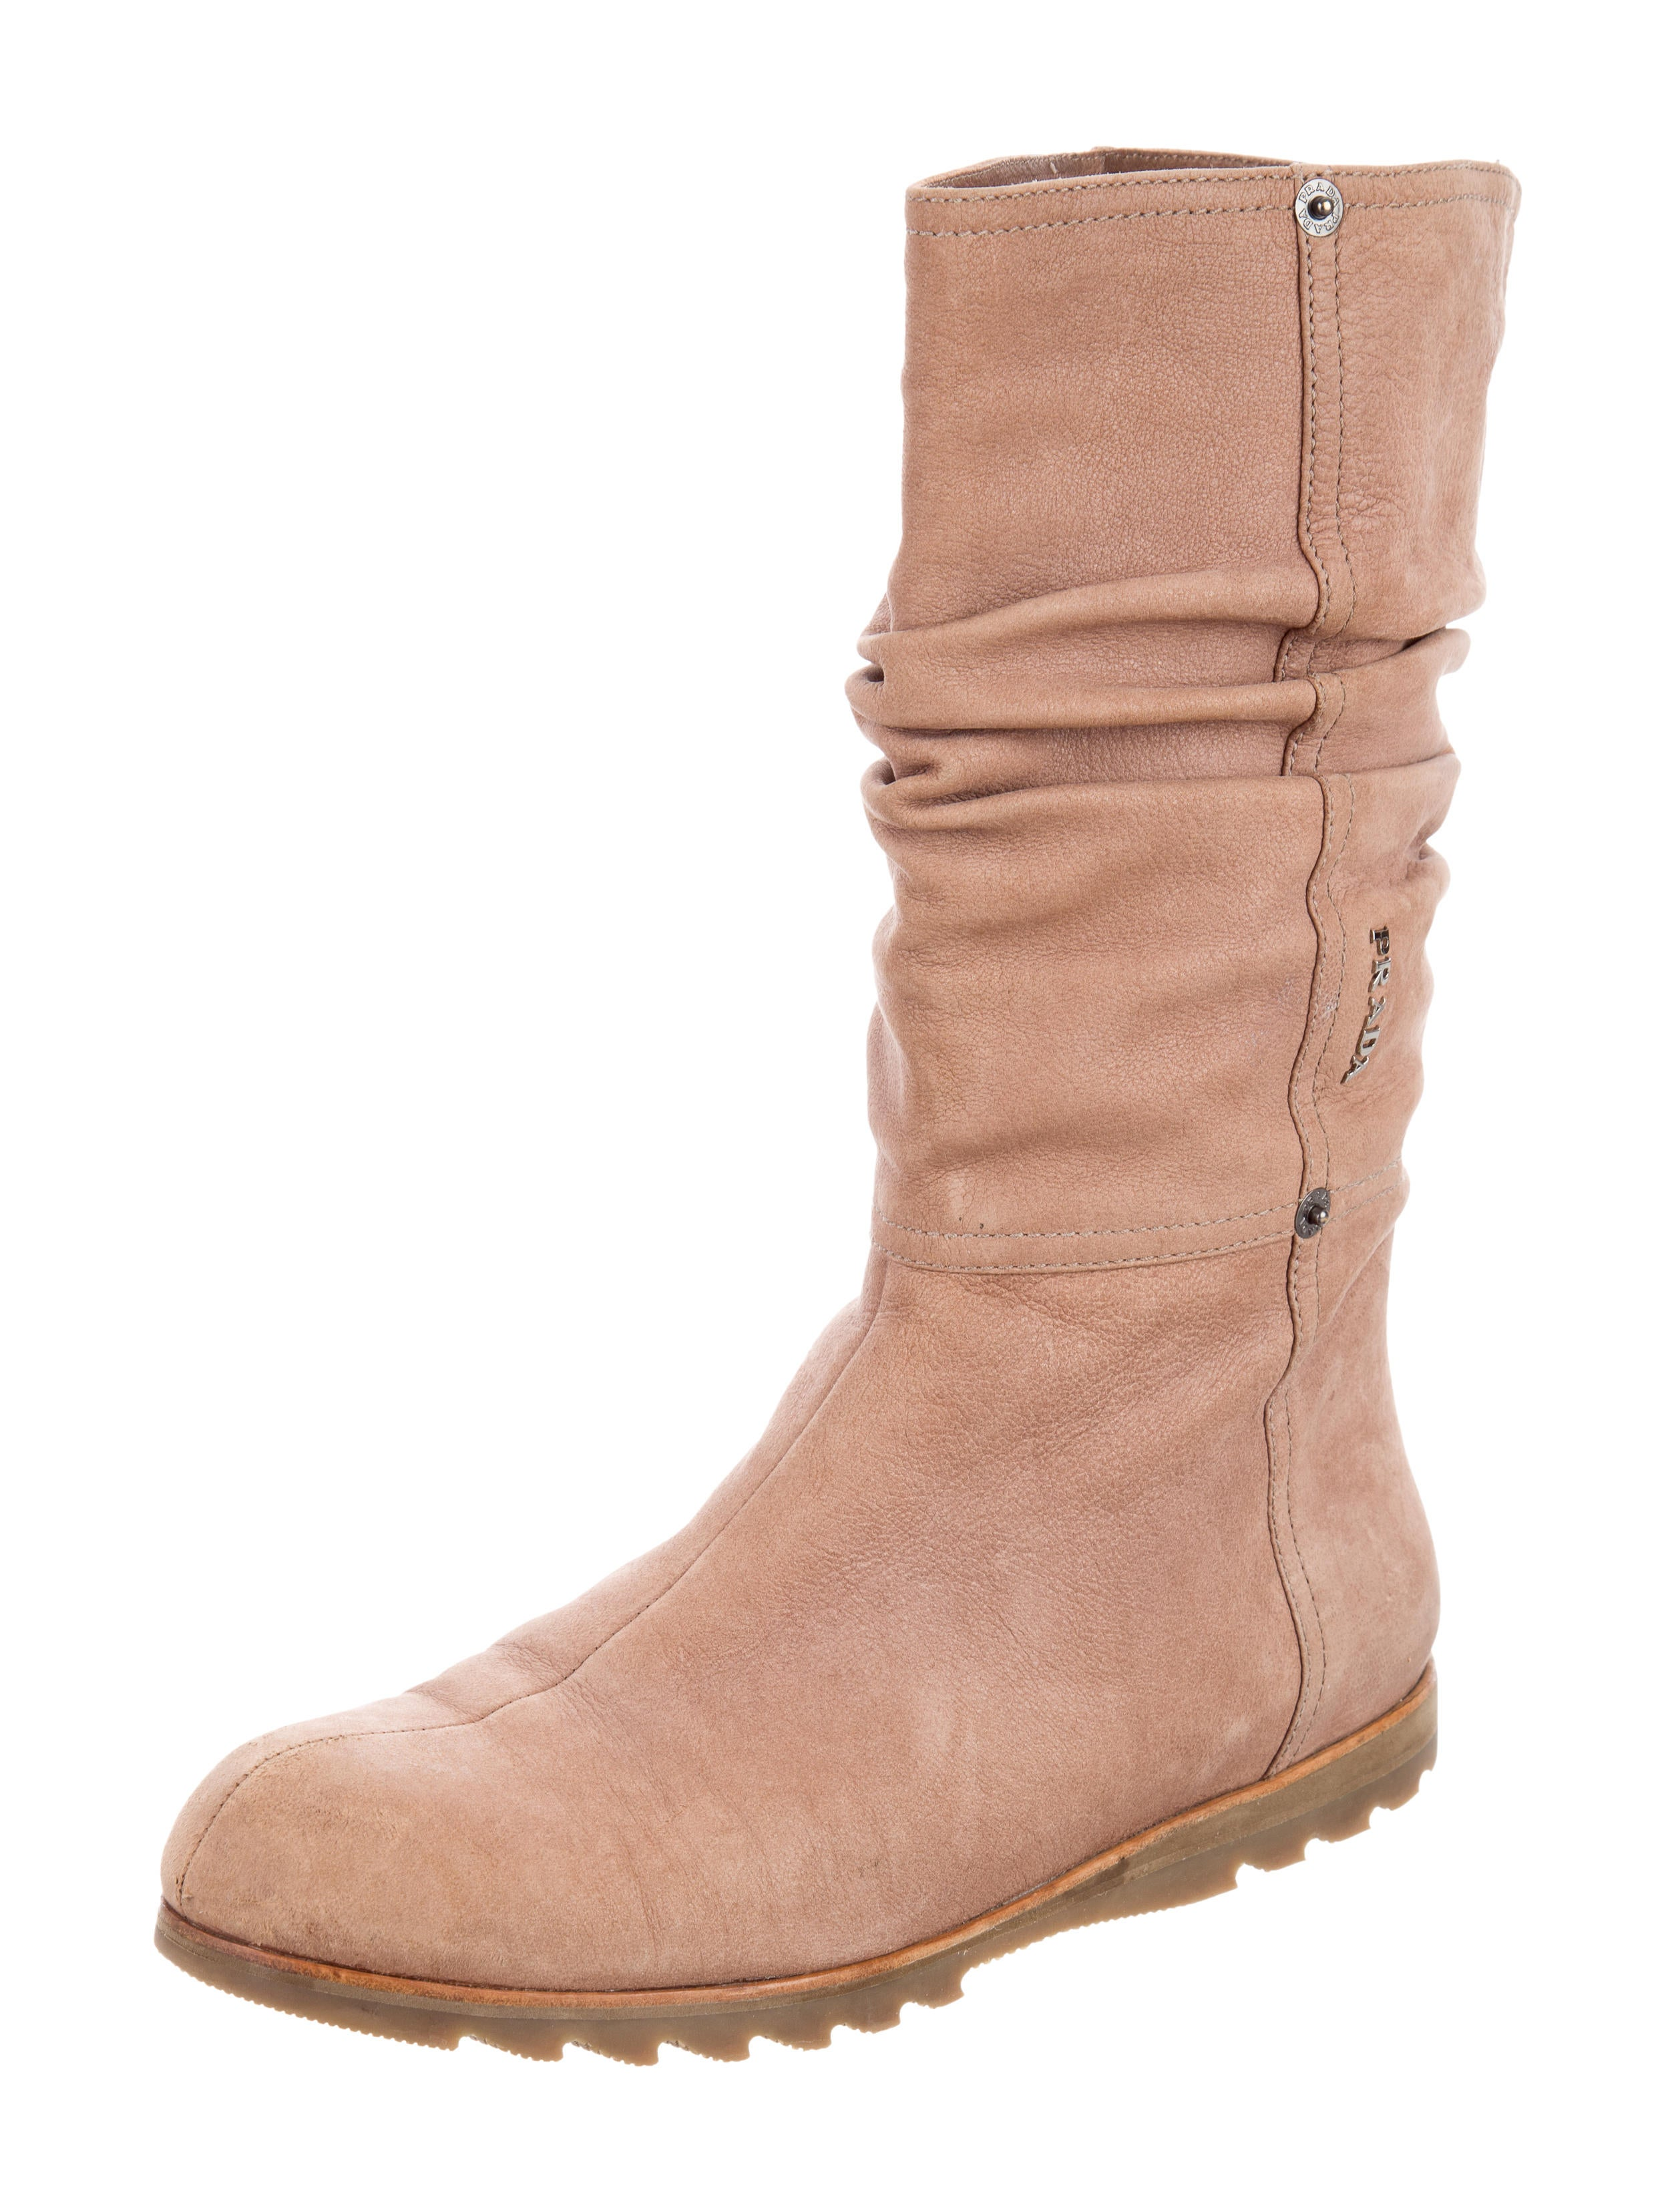 prada sport suede mid calf boots shoes wpr38850 the